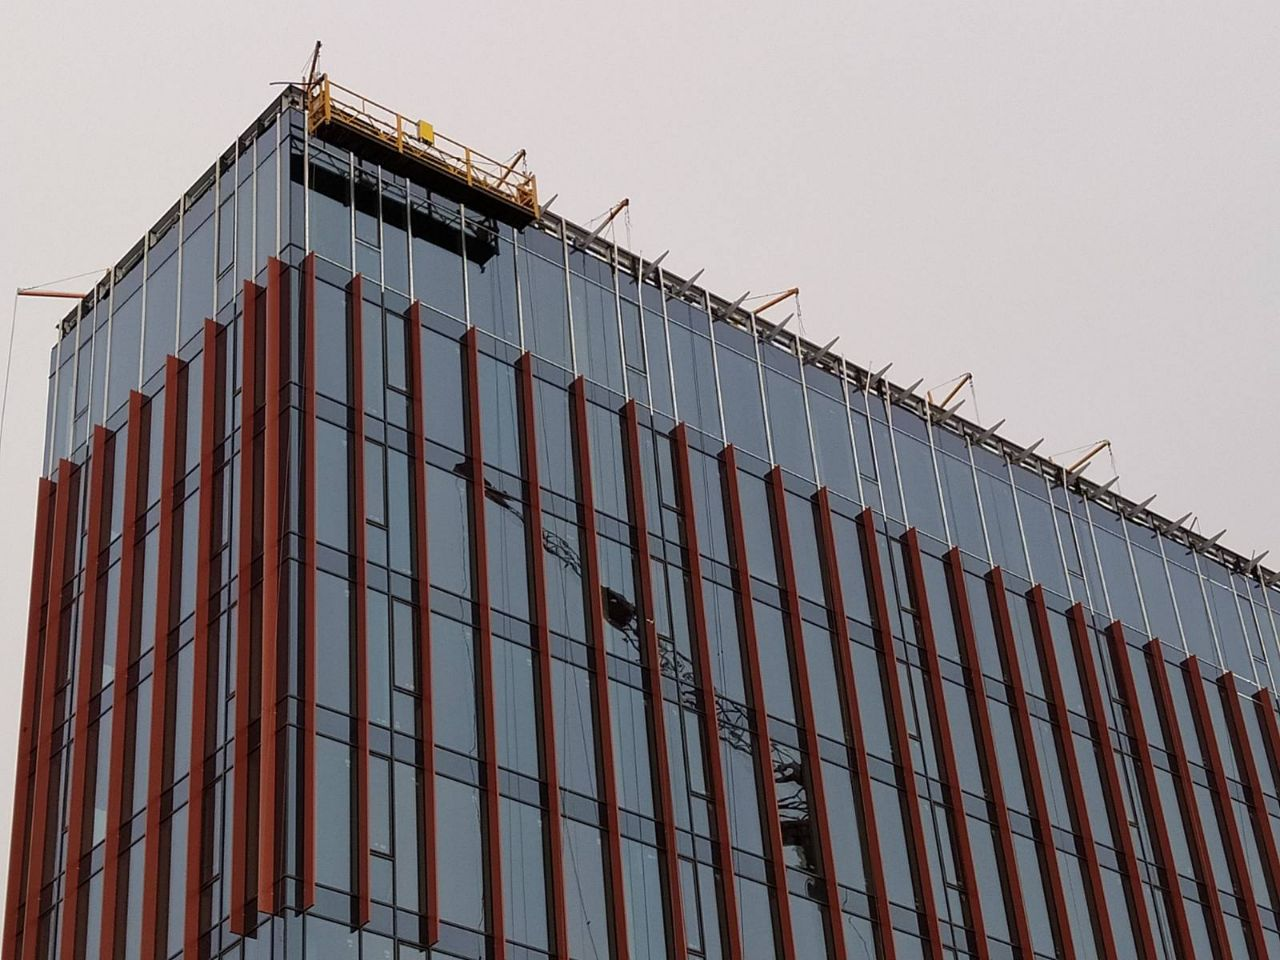 монтаж кронштейнов фасадной системы BMU на ТРЦ Ретровилль